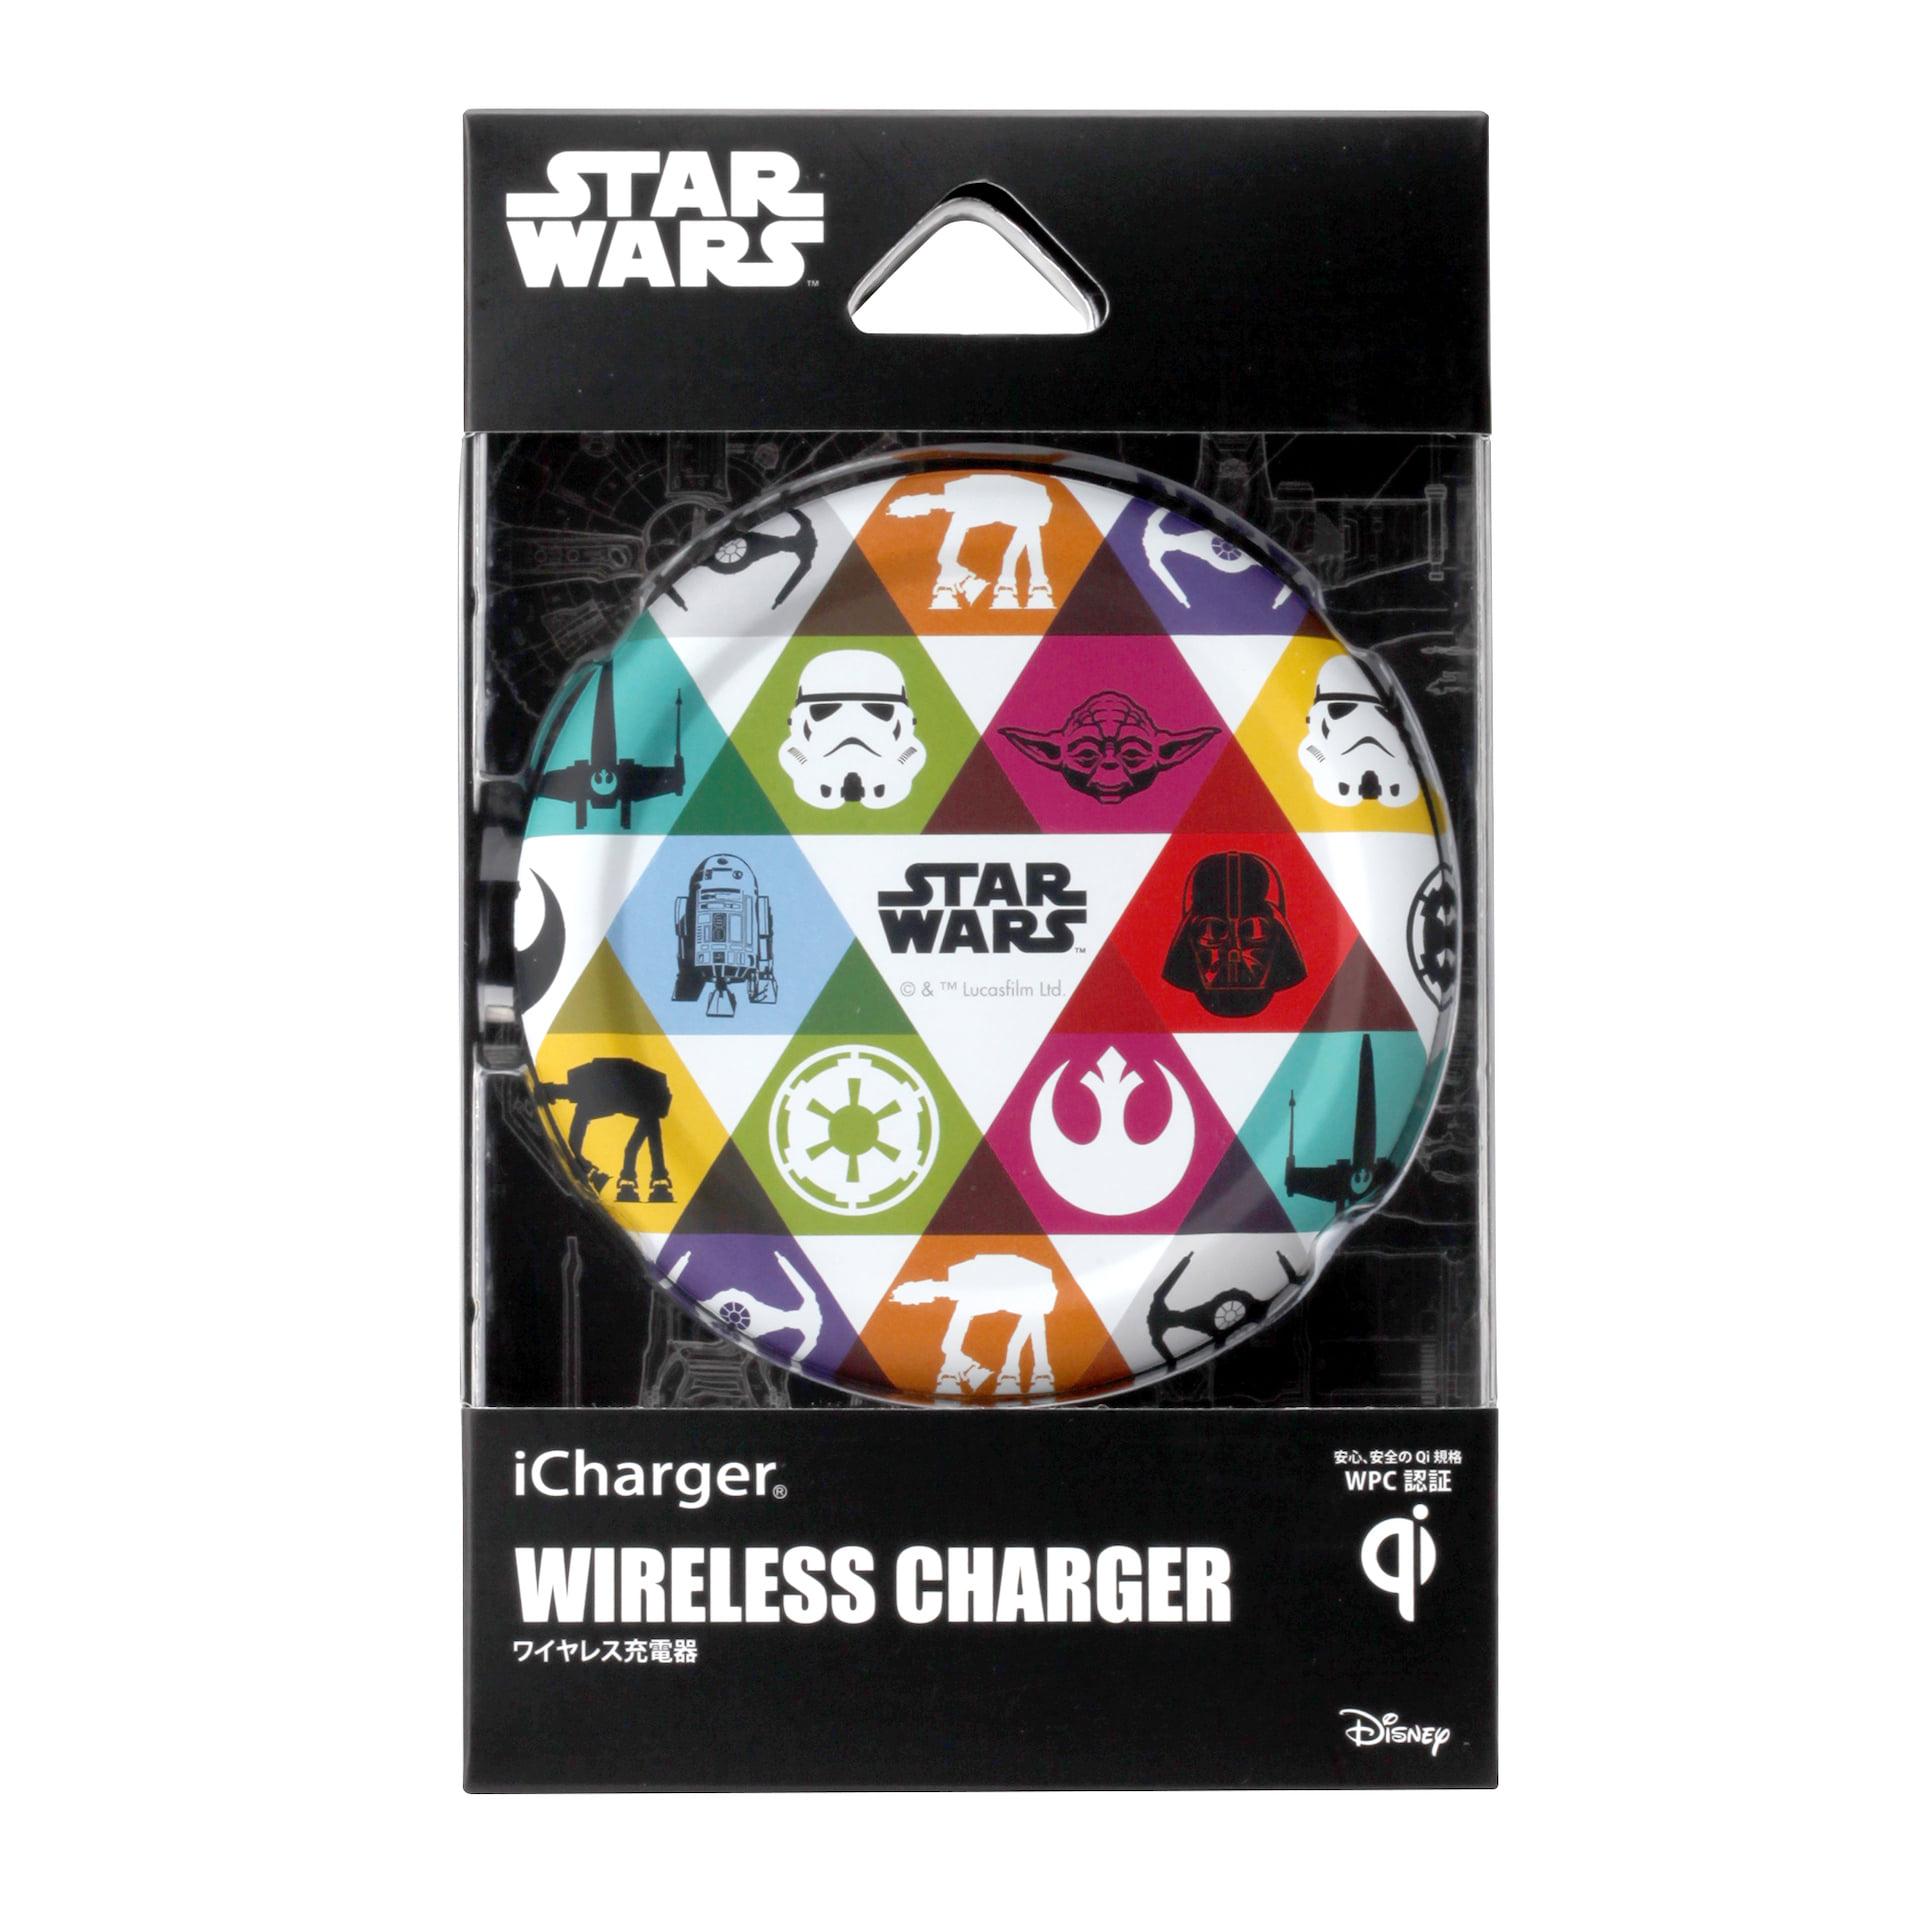 「MARVEL」「STARWARS」仕様のQi認証ワイヤレス充電器が登場|厚さ12mm、置くだけで充電可能 technology190718marvel-qichager_2-1920x1920